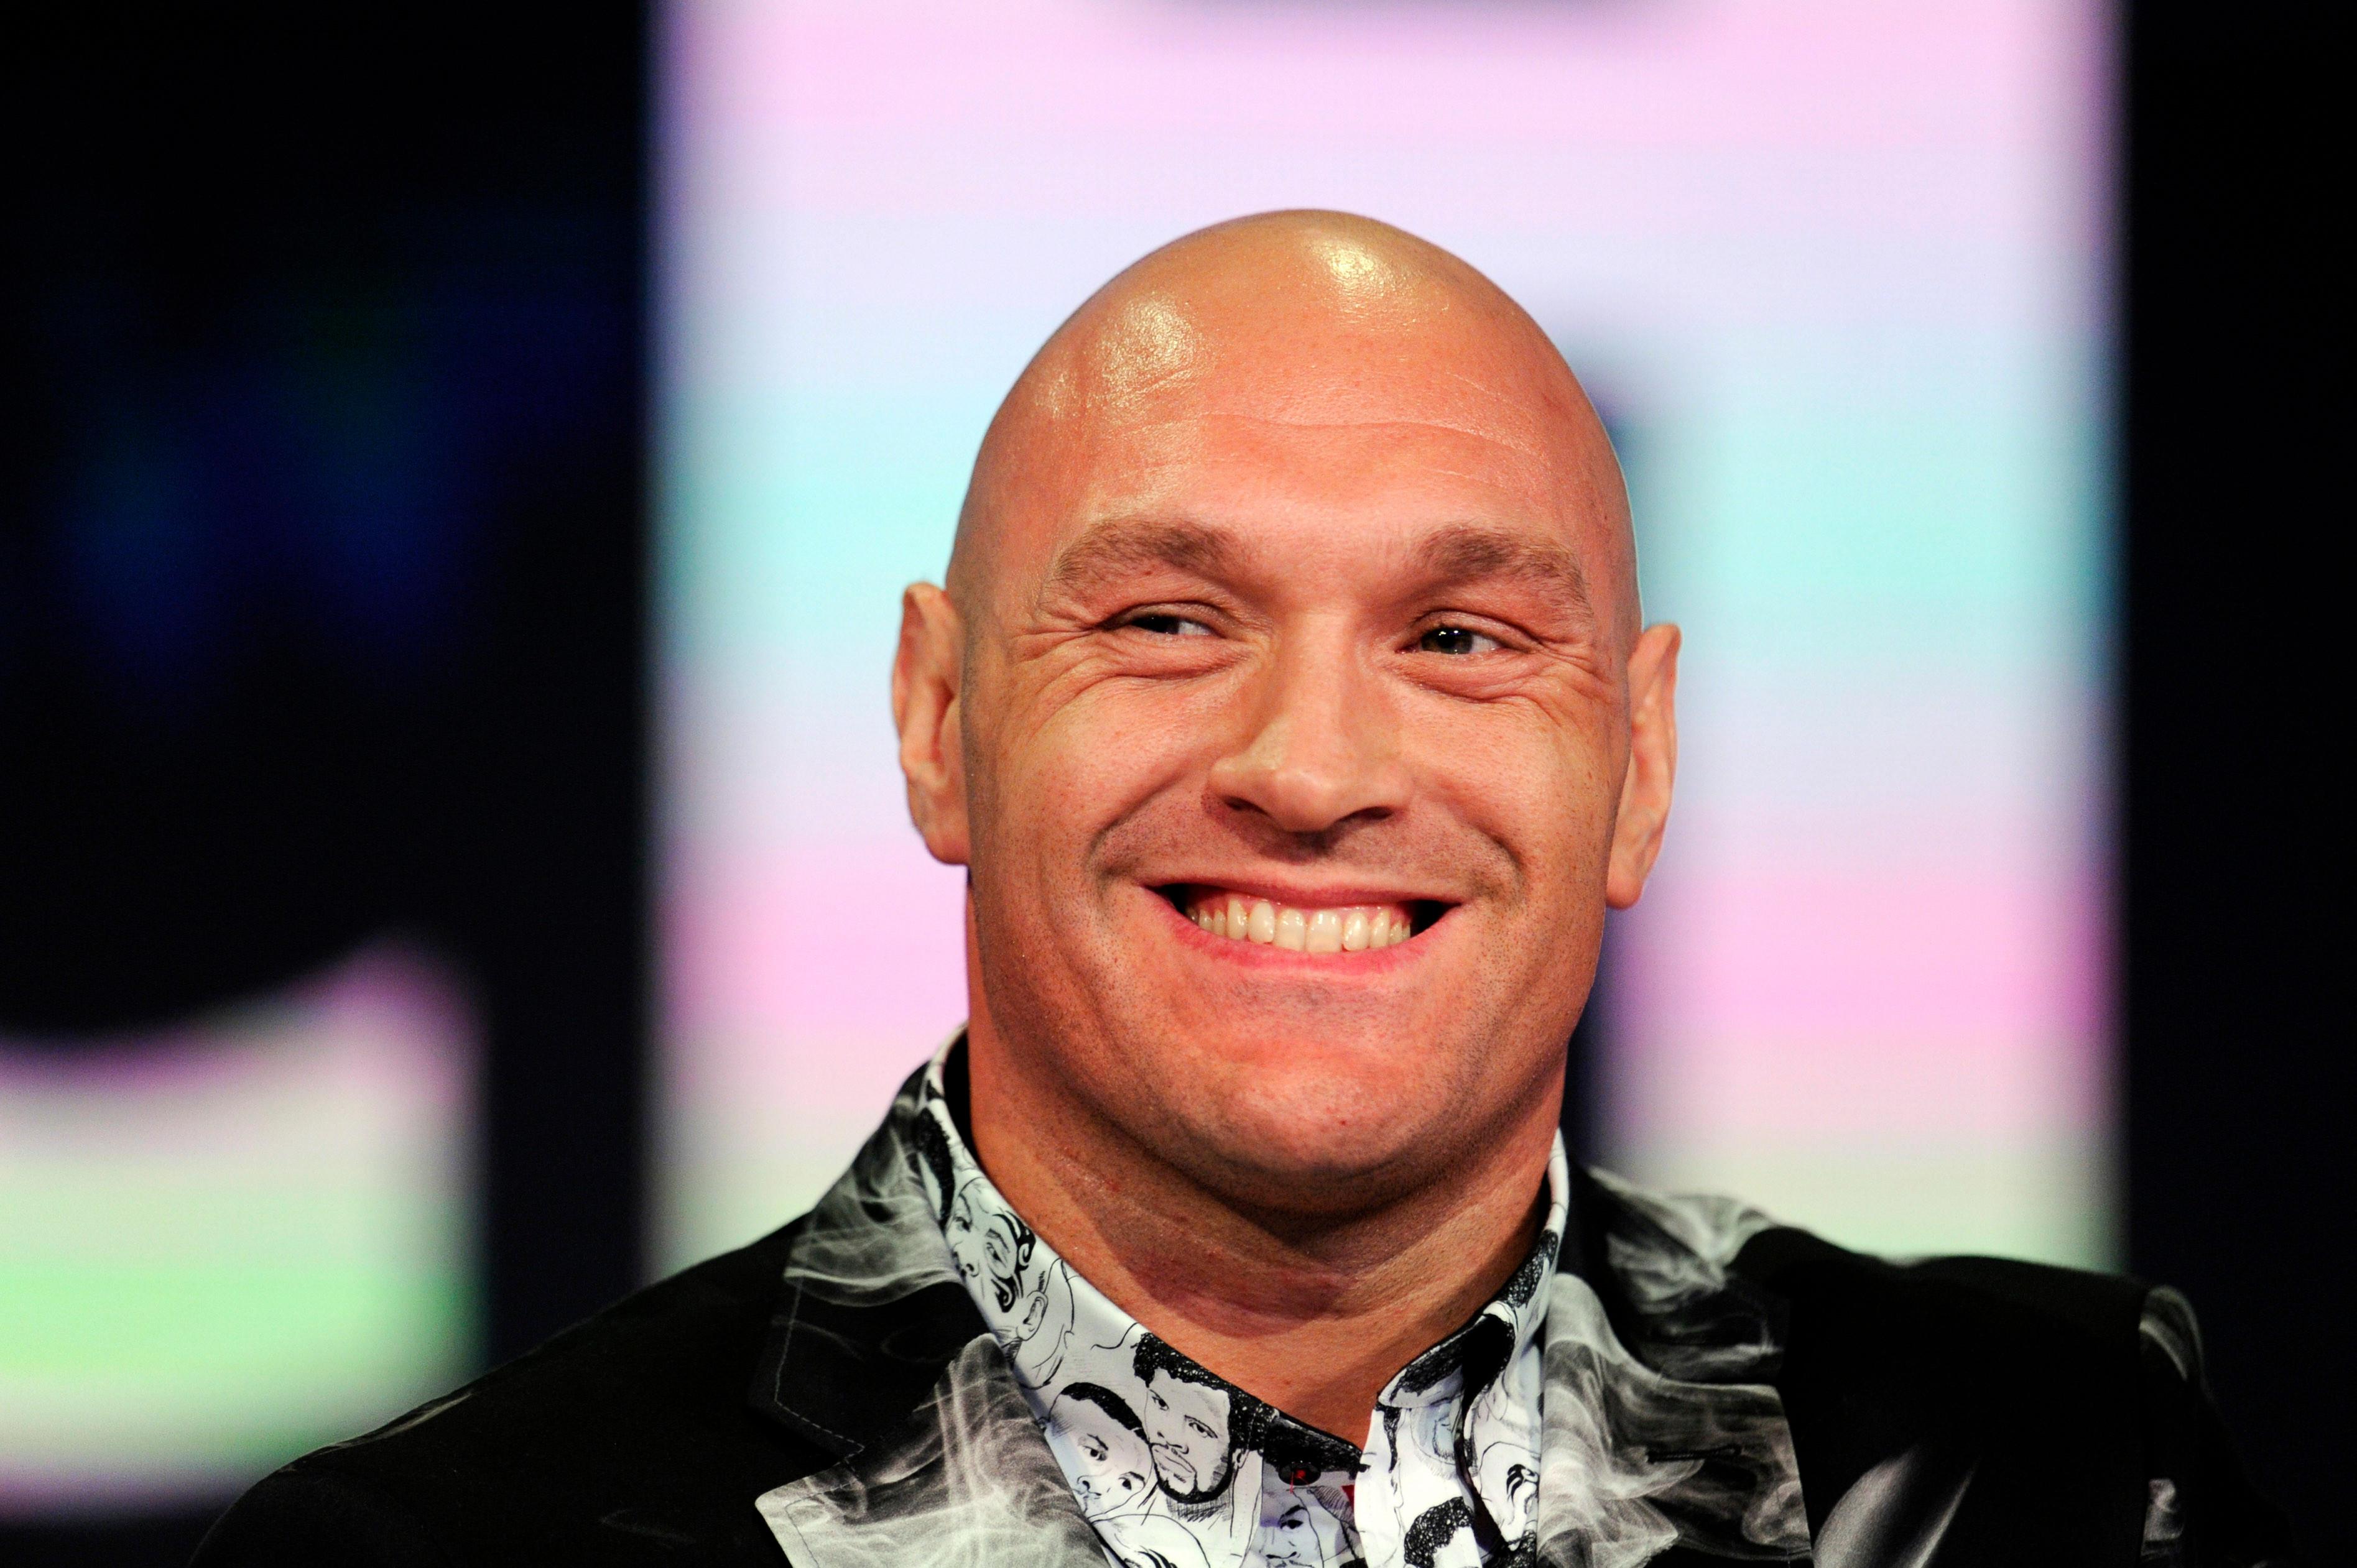 Tyson Fury speaks ahead of his fight with Tom Schwarz in Las Vegas